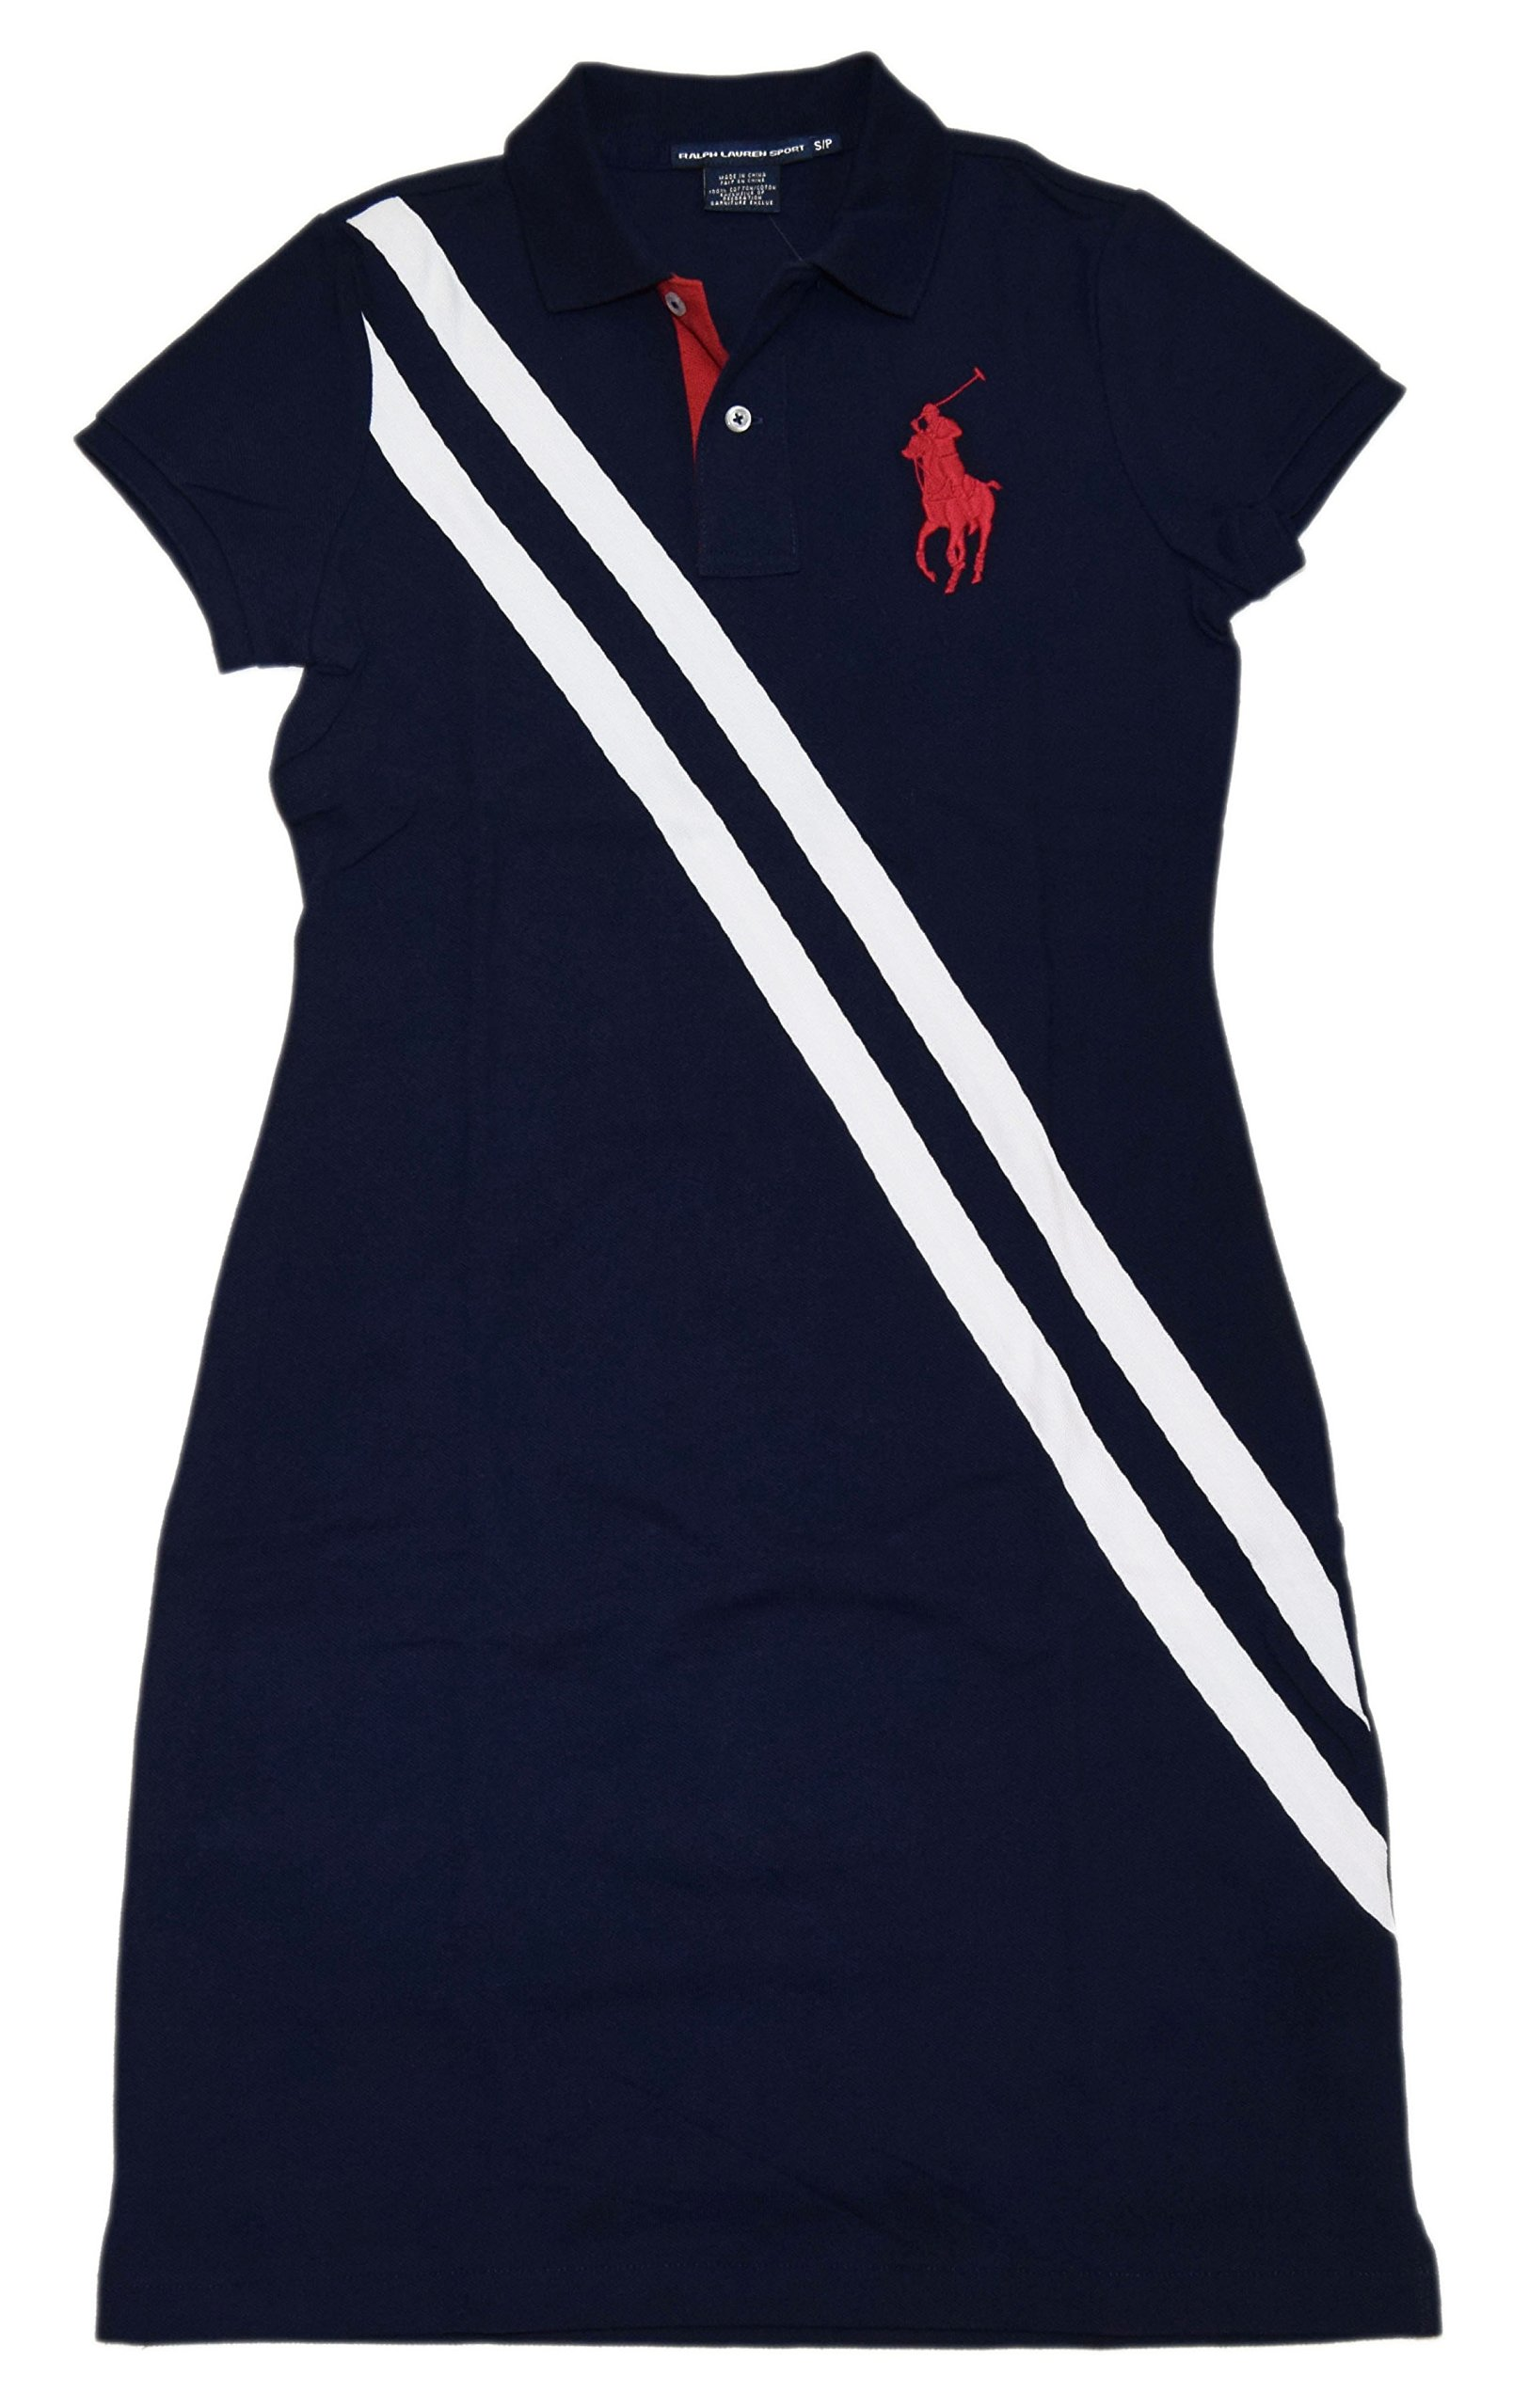 Polo Ralph Lauren Sport Womens Big Pony Tennis Dress Mesh Shirt Navy Red Small